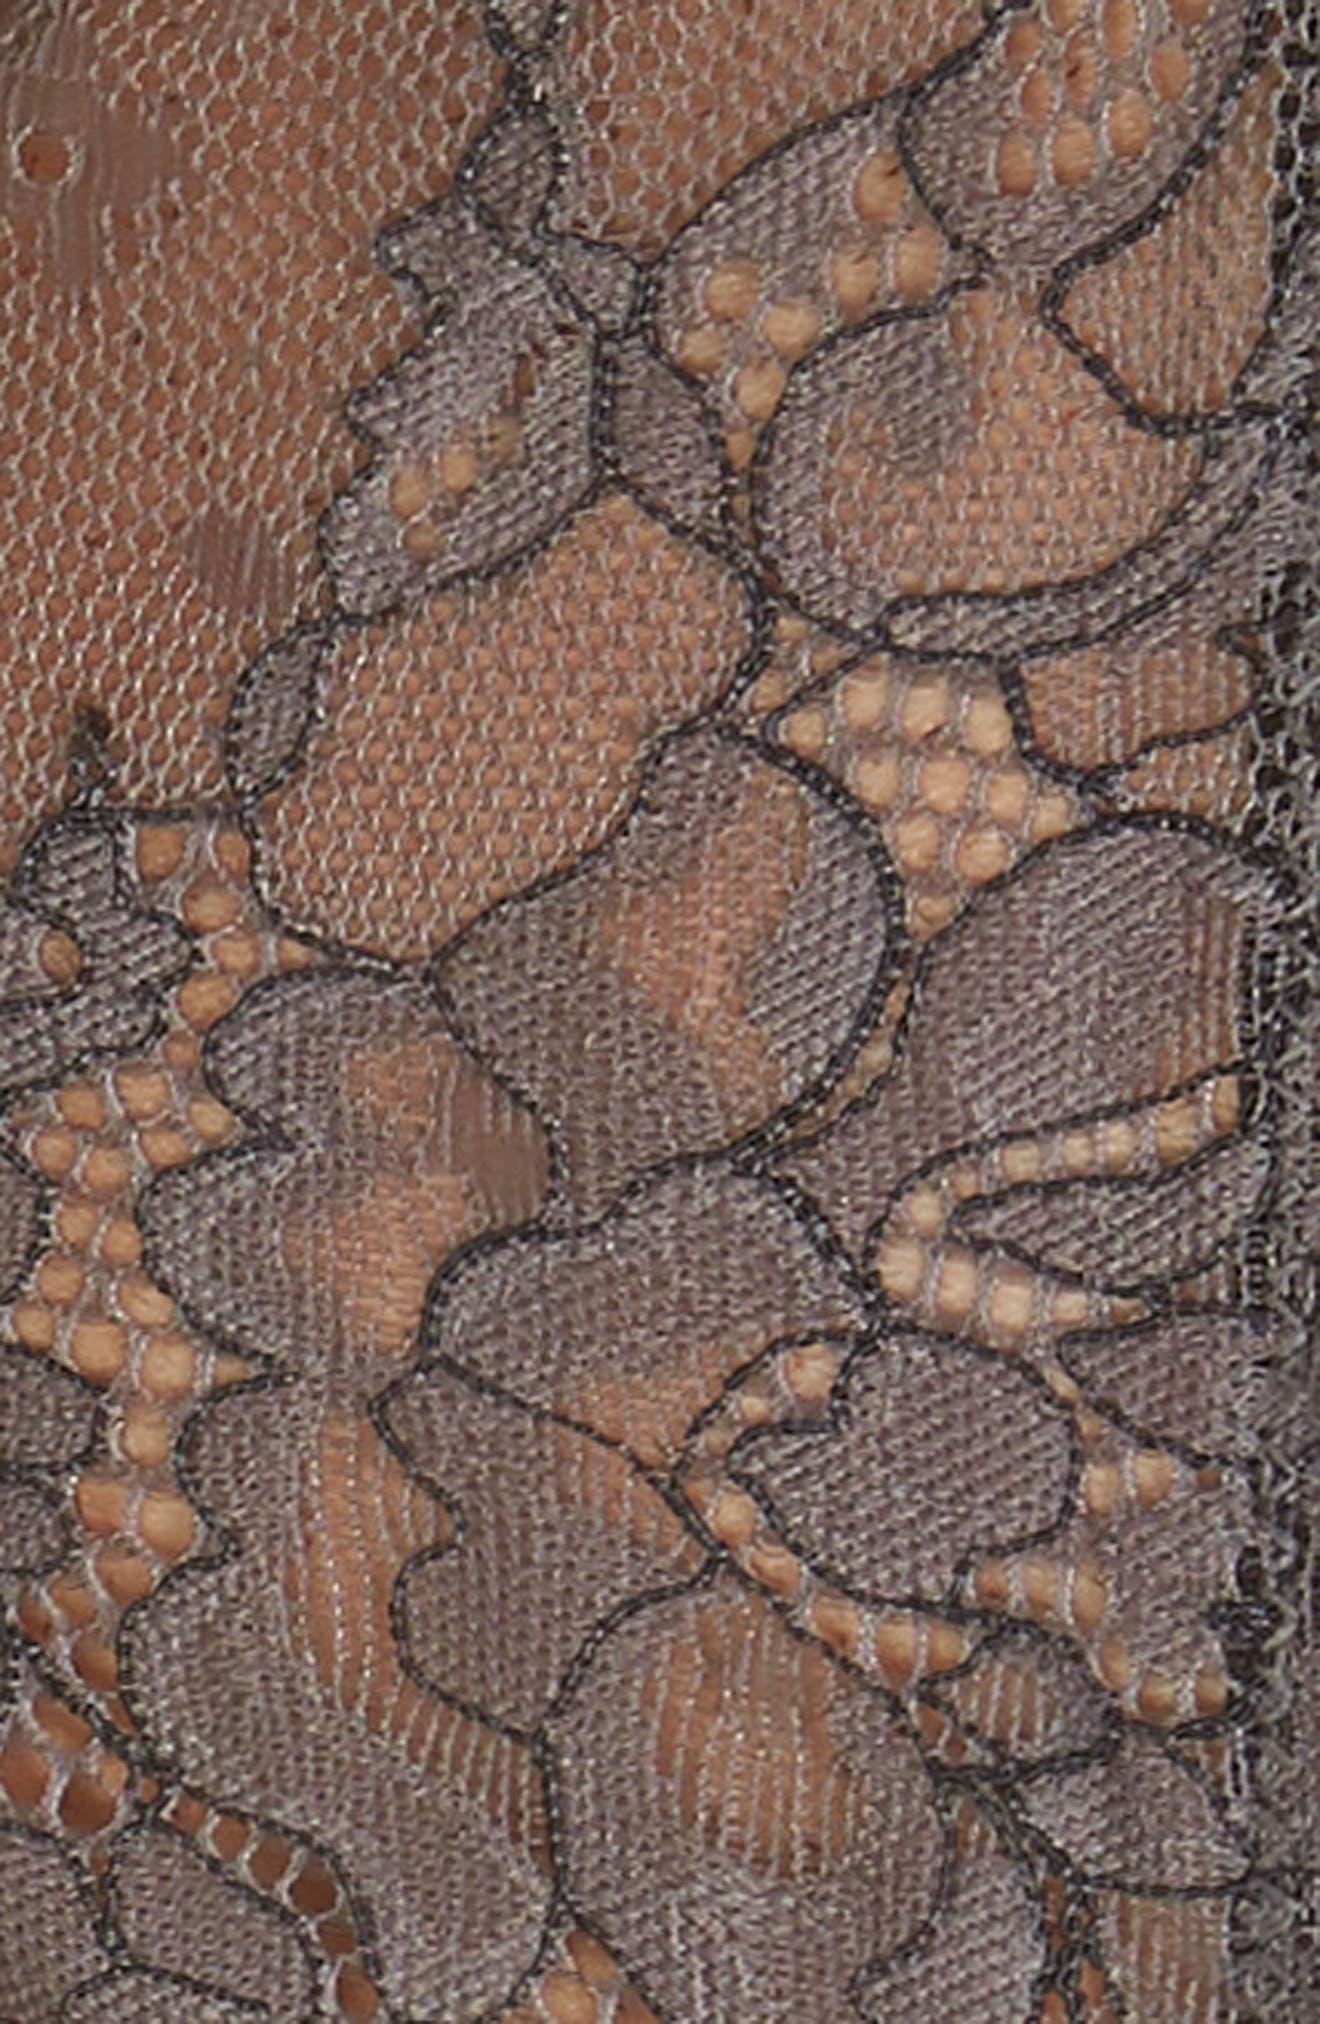 Thistle & Spire Constellation Lace Bikini,                             Alternate thumbnail 8, color,                             Steel